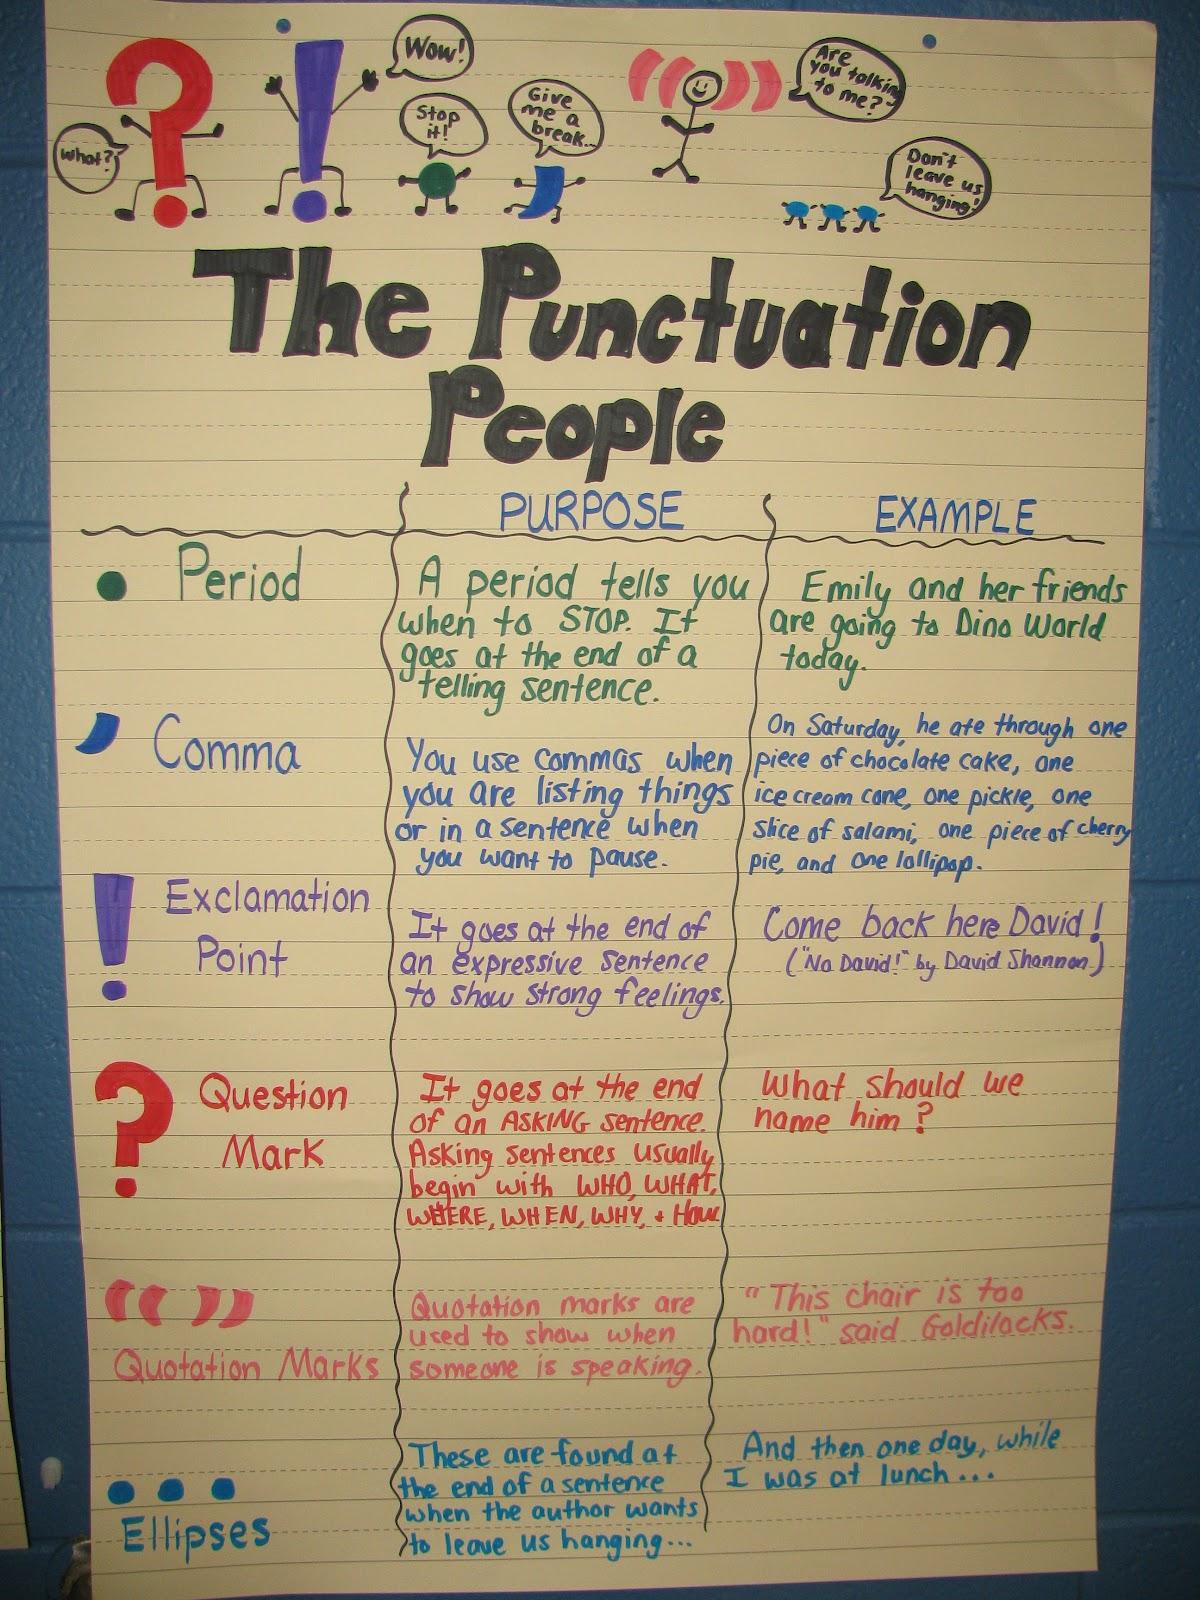 Simply Sweet Teaching Punctuation People